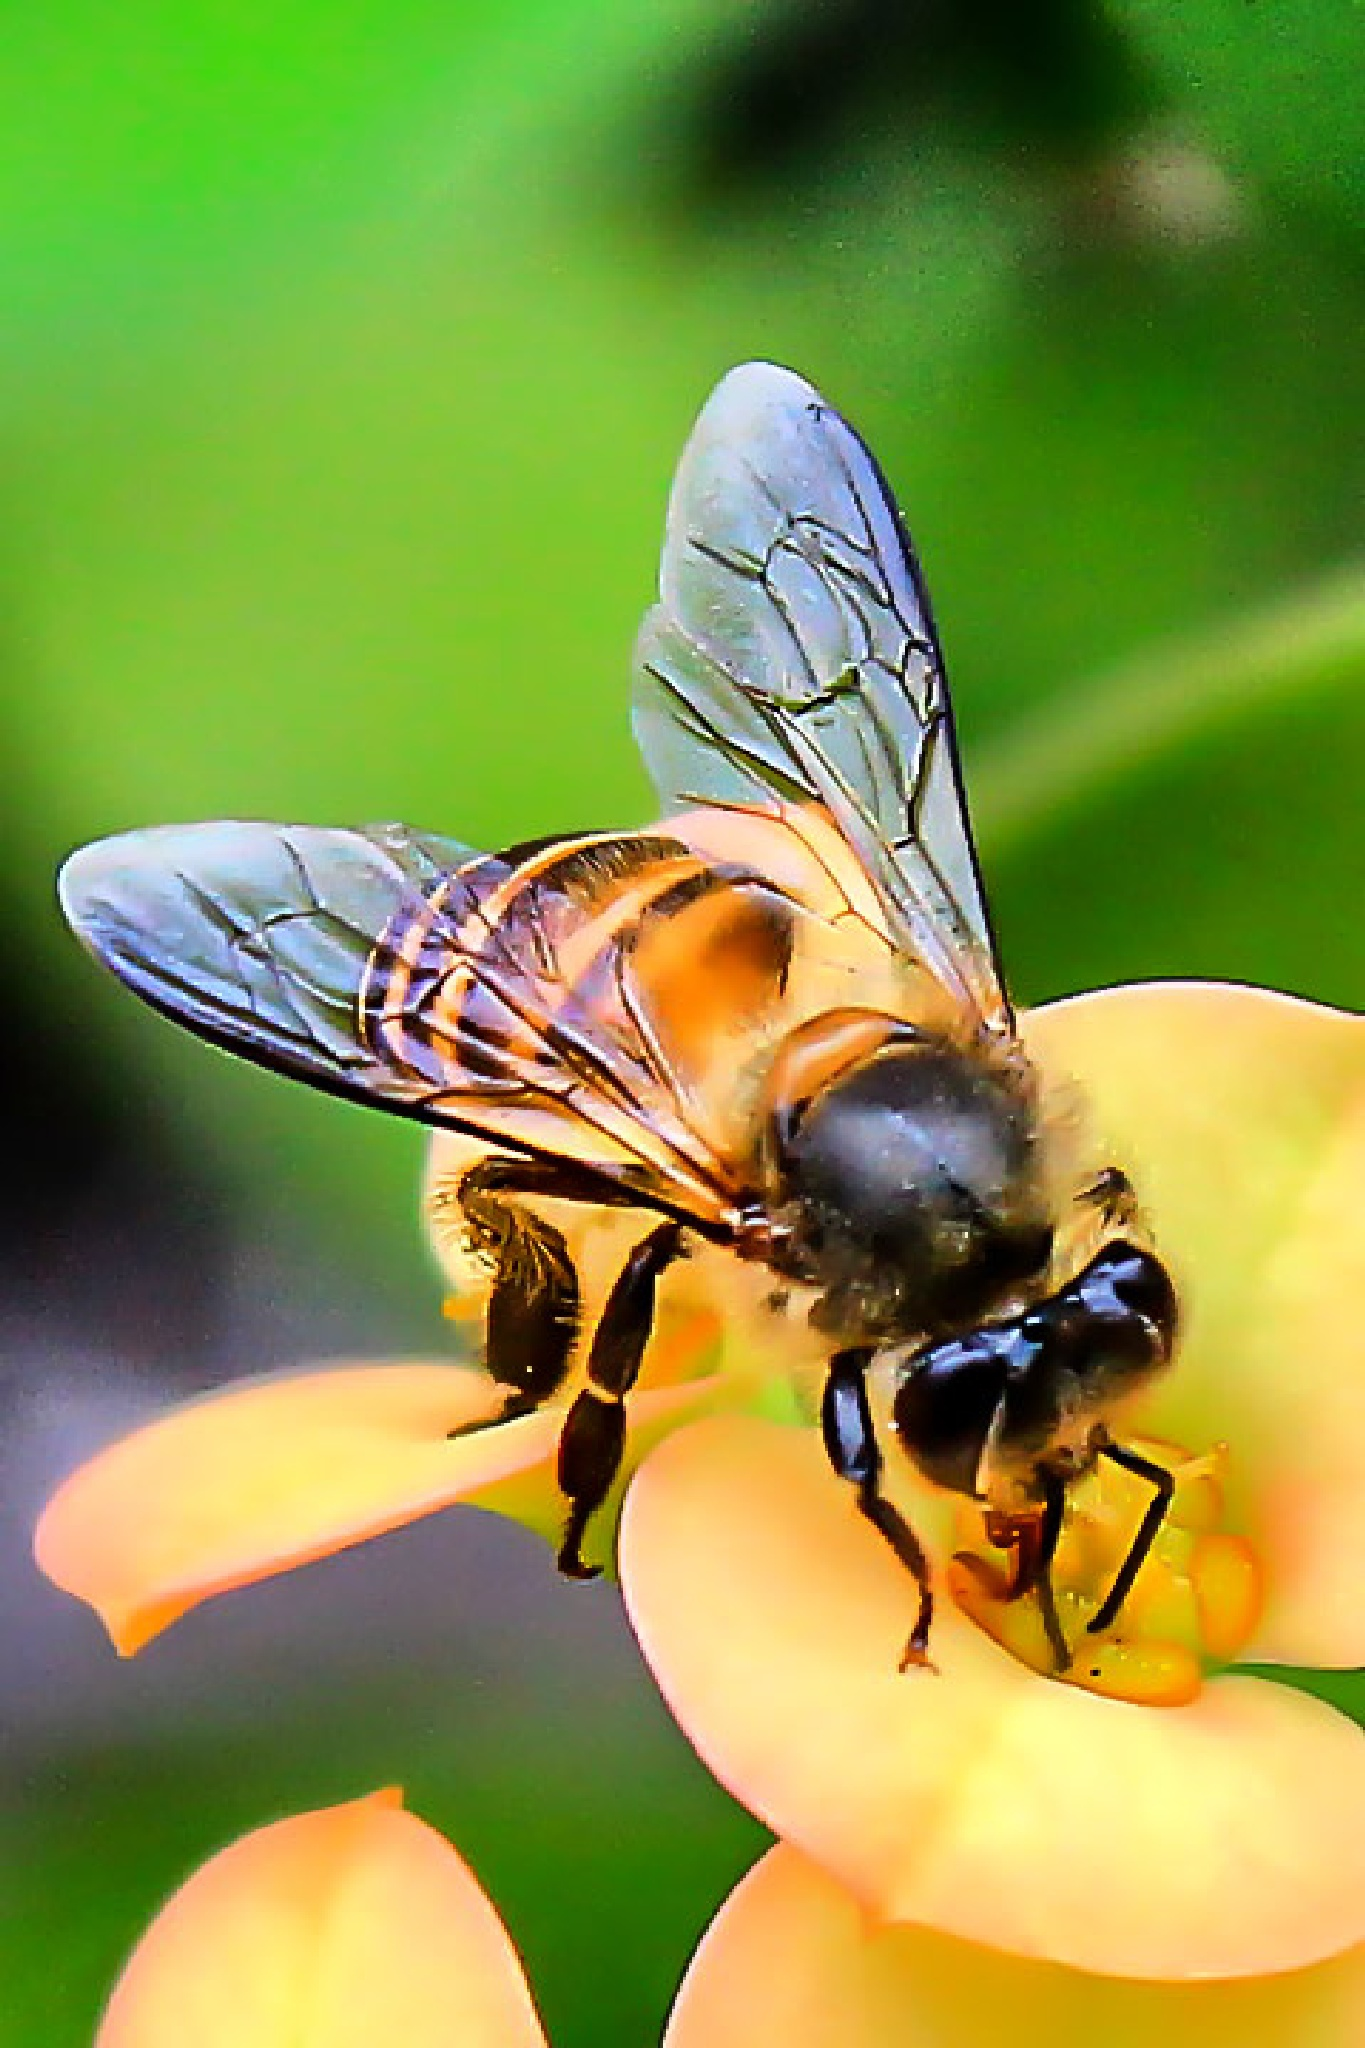 Honey Bee by DEka Parartha Pinatih